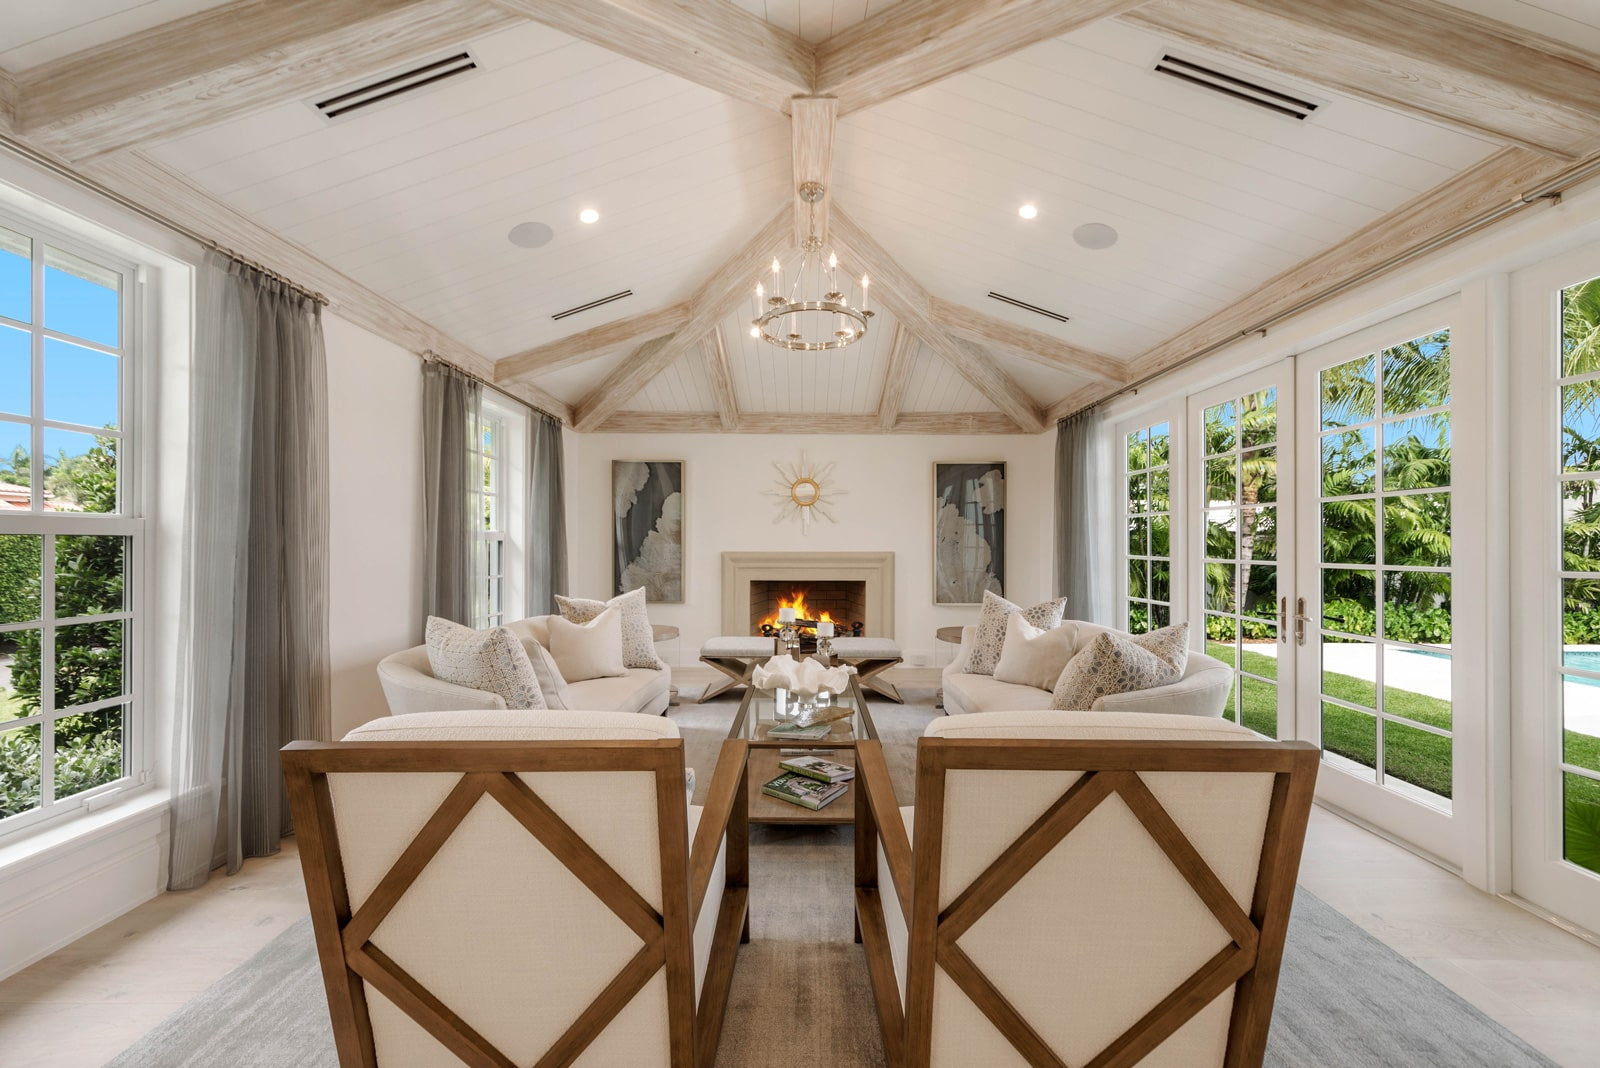 ecclestone-homes-palm-beach-interior-renovation-den-pg02-min